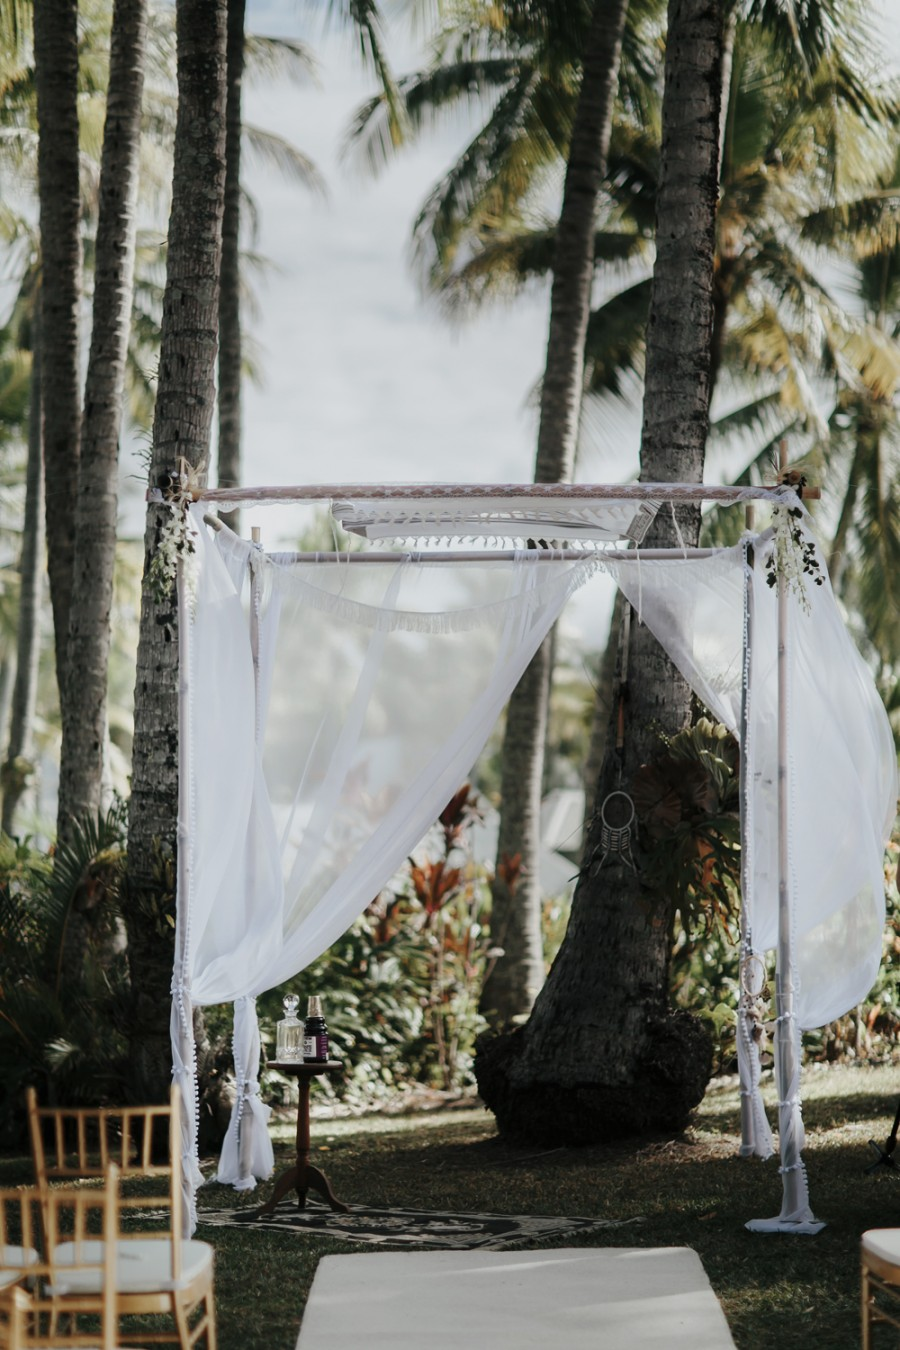 boho-tipi-wedding-sheraton-port-douglas-oli-sansom-11-900x0-c-default.jpg